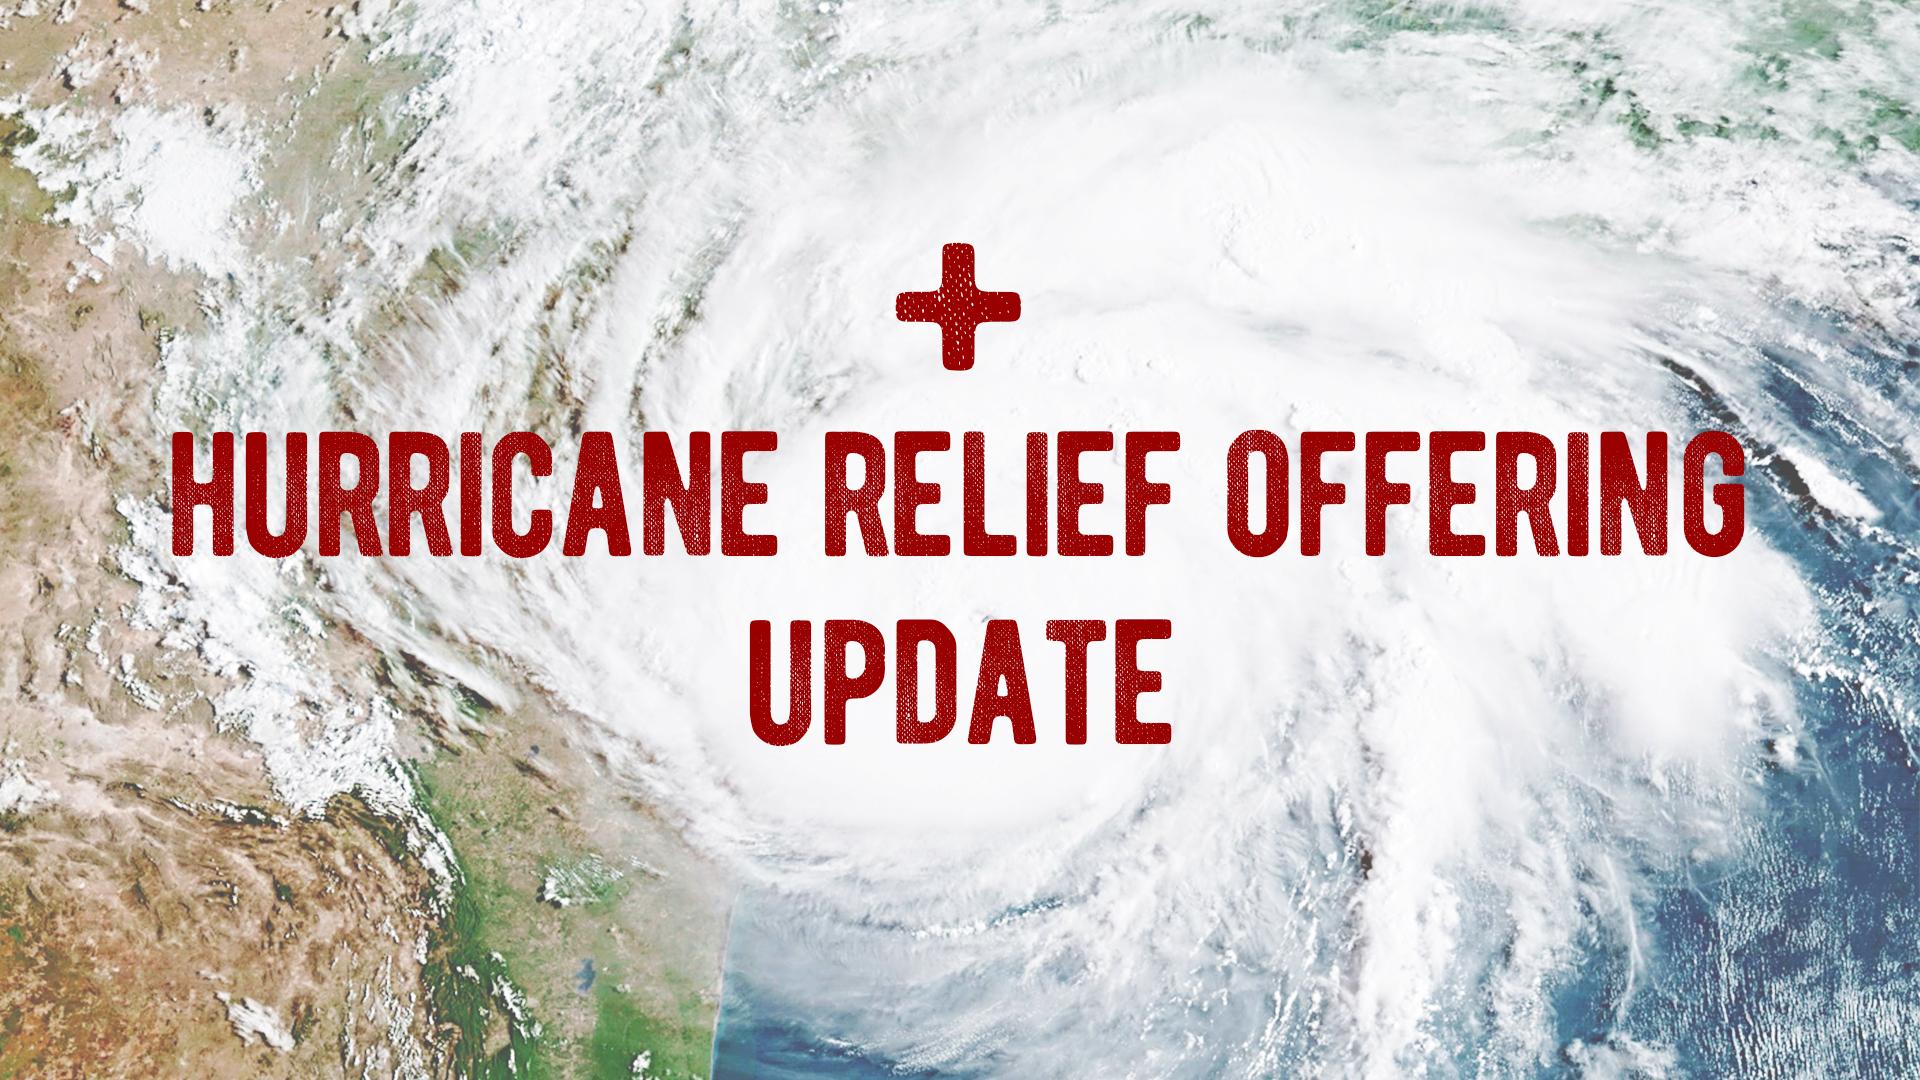 HurricaneReliefUpdate.jpg